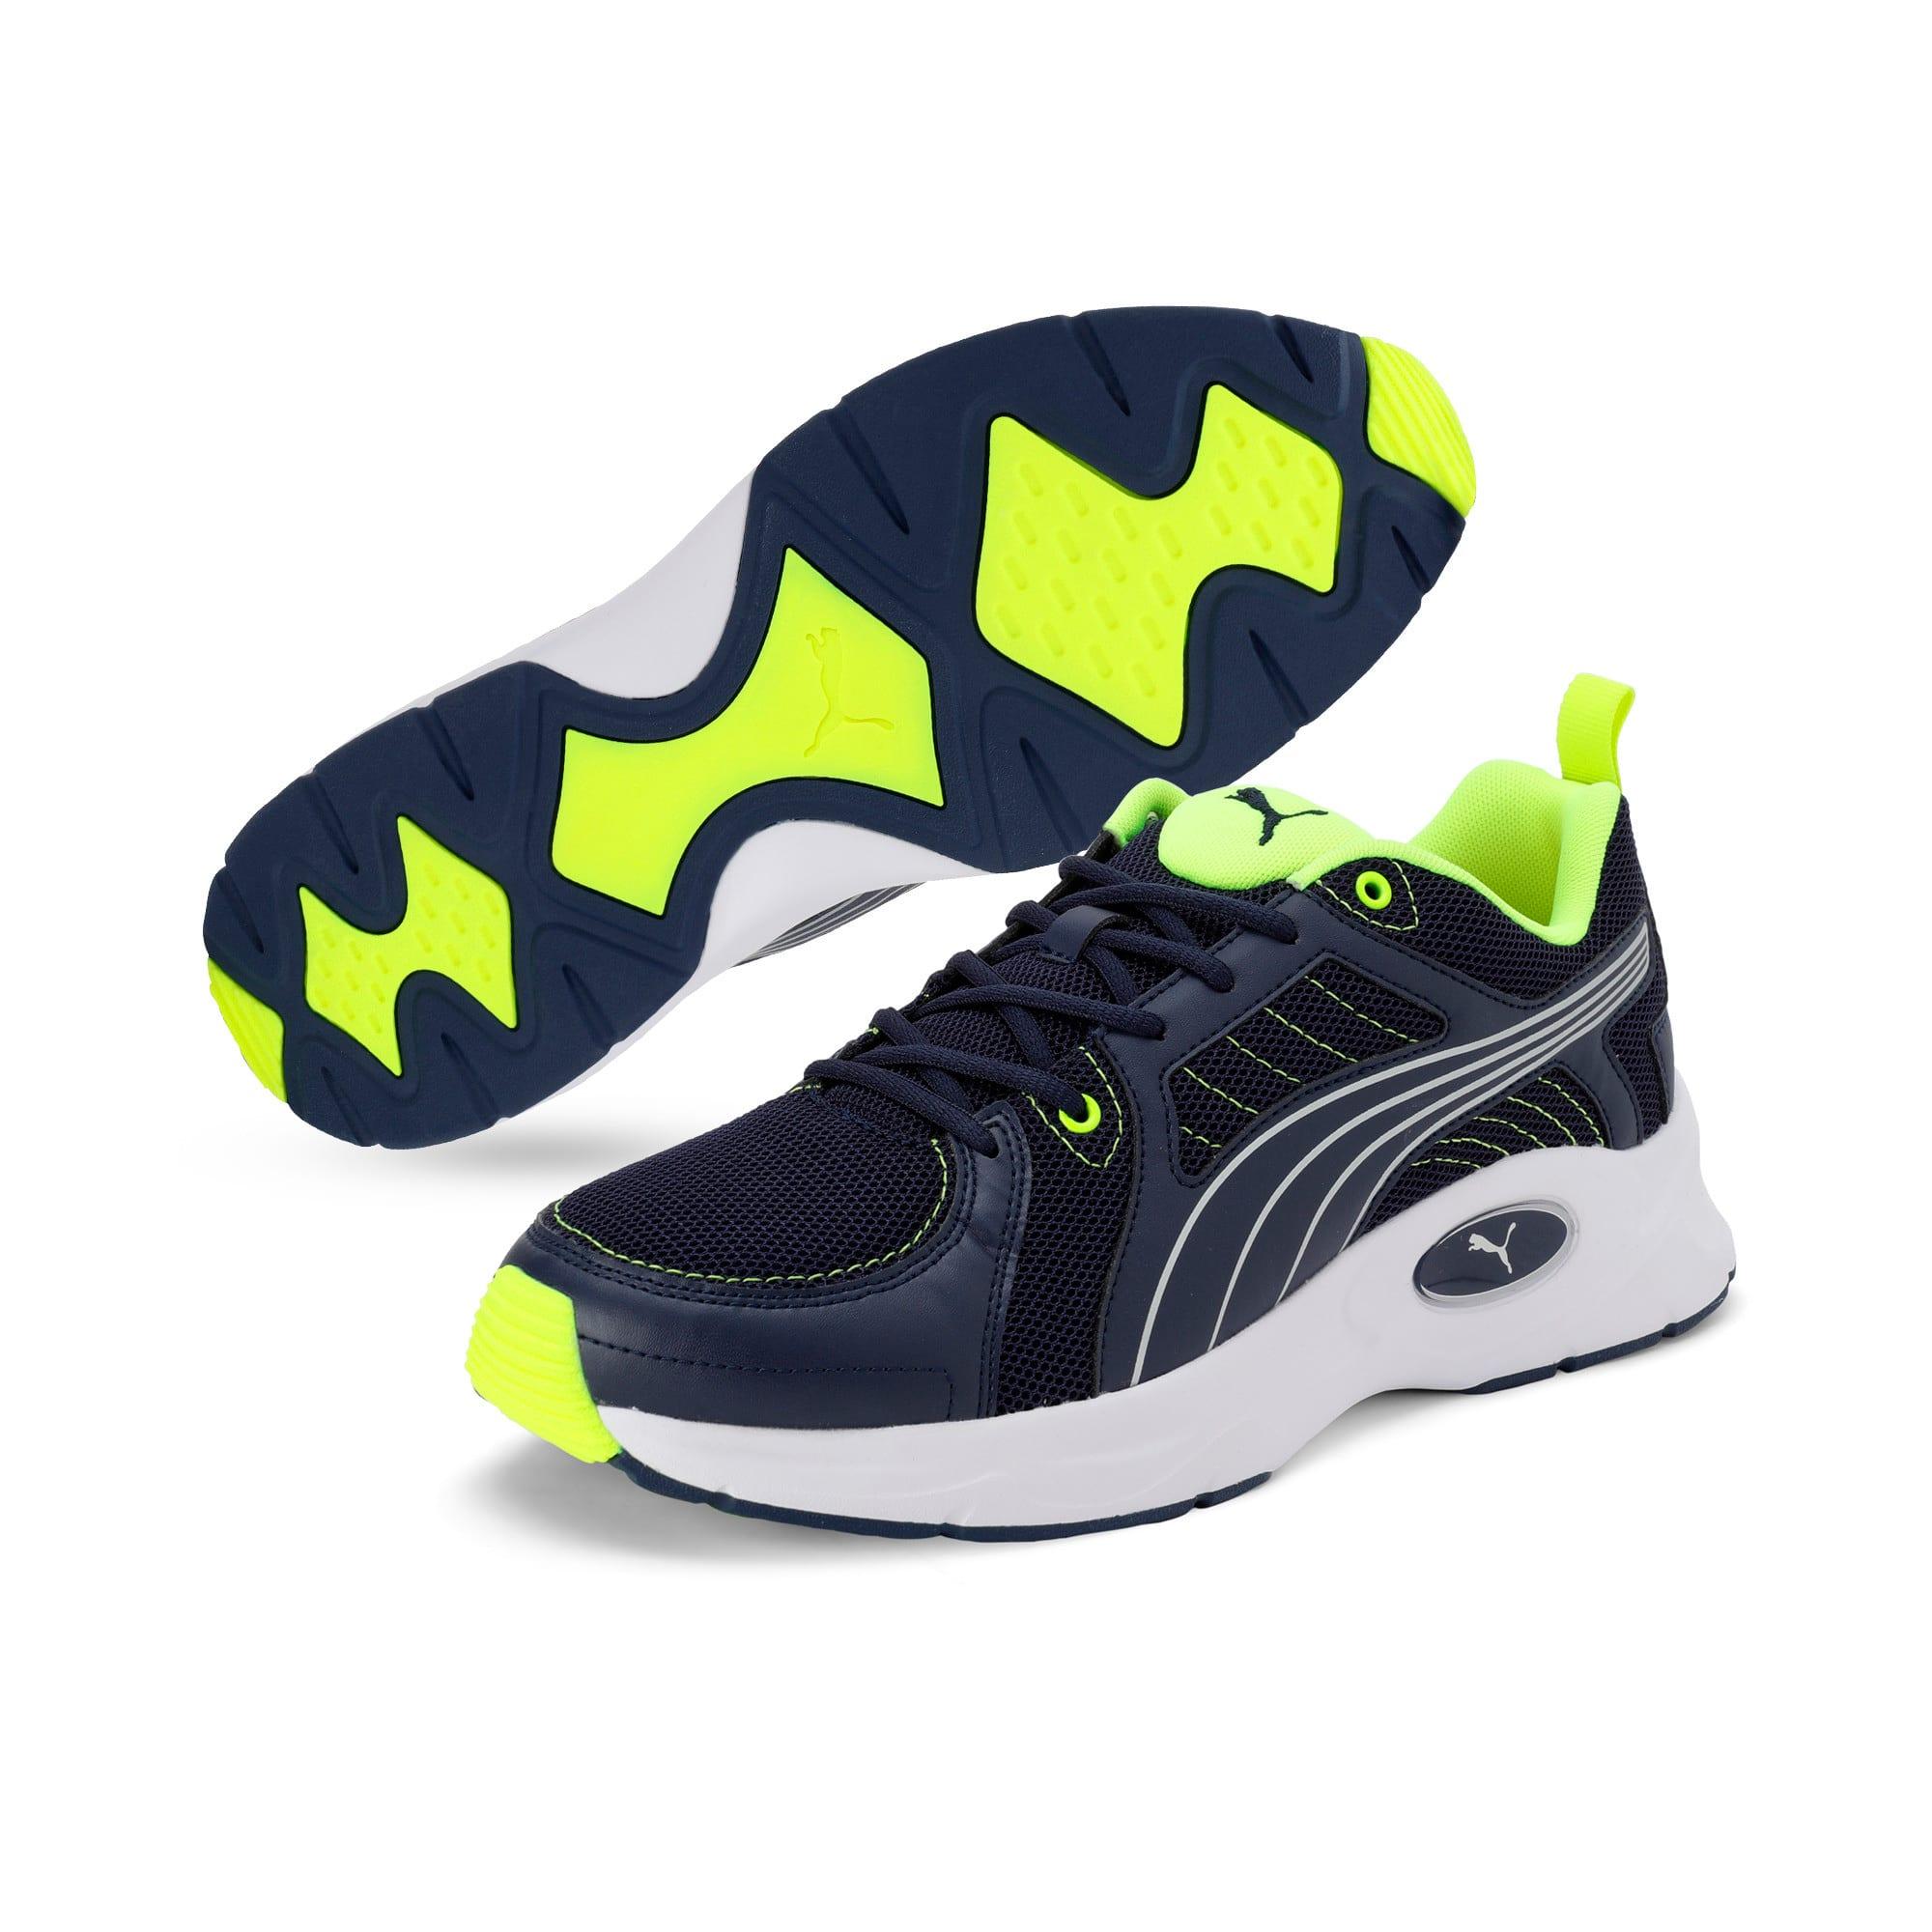 Thumbnail 4 of Nucleus Run Training Shoes, Peacoat-Puma Silver, medium-IND